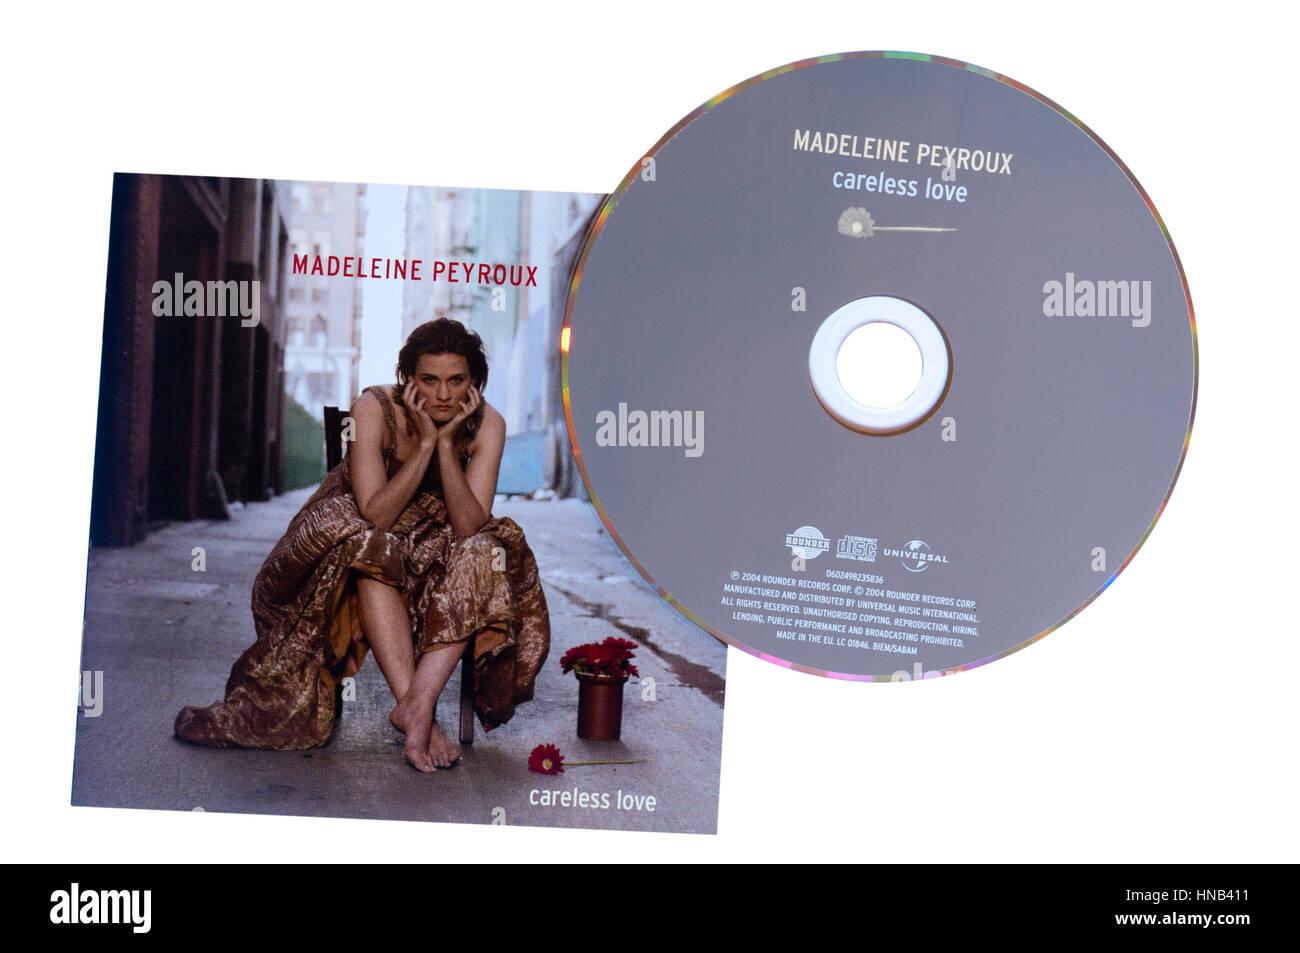 Madeleine Peyroux Careless Love Music CD - Stock Image